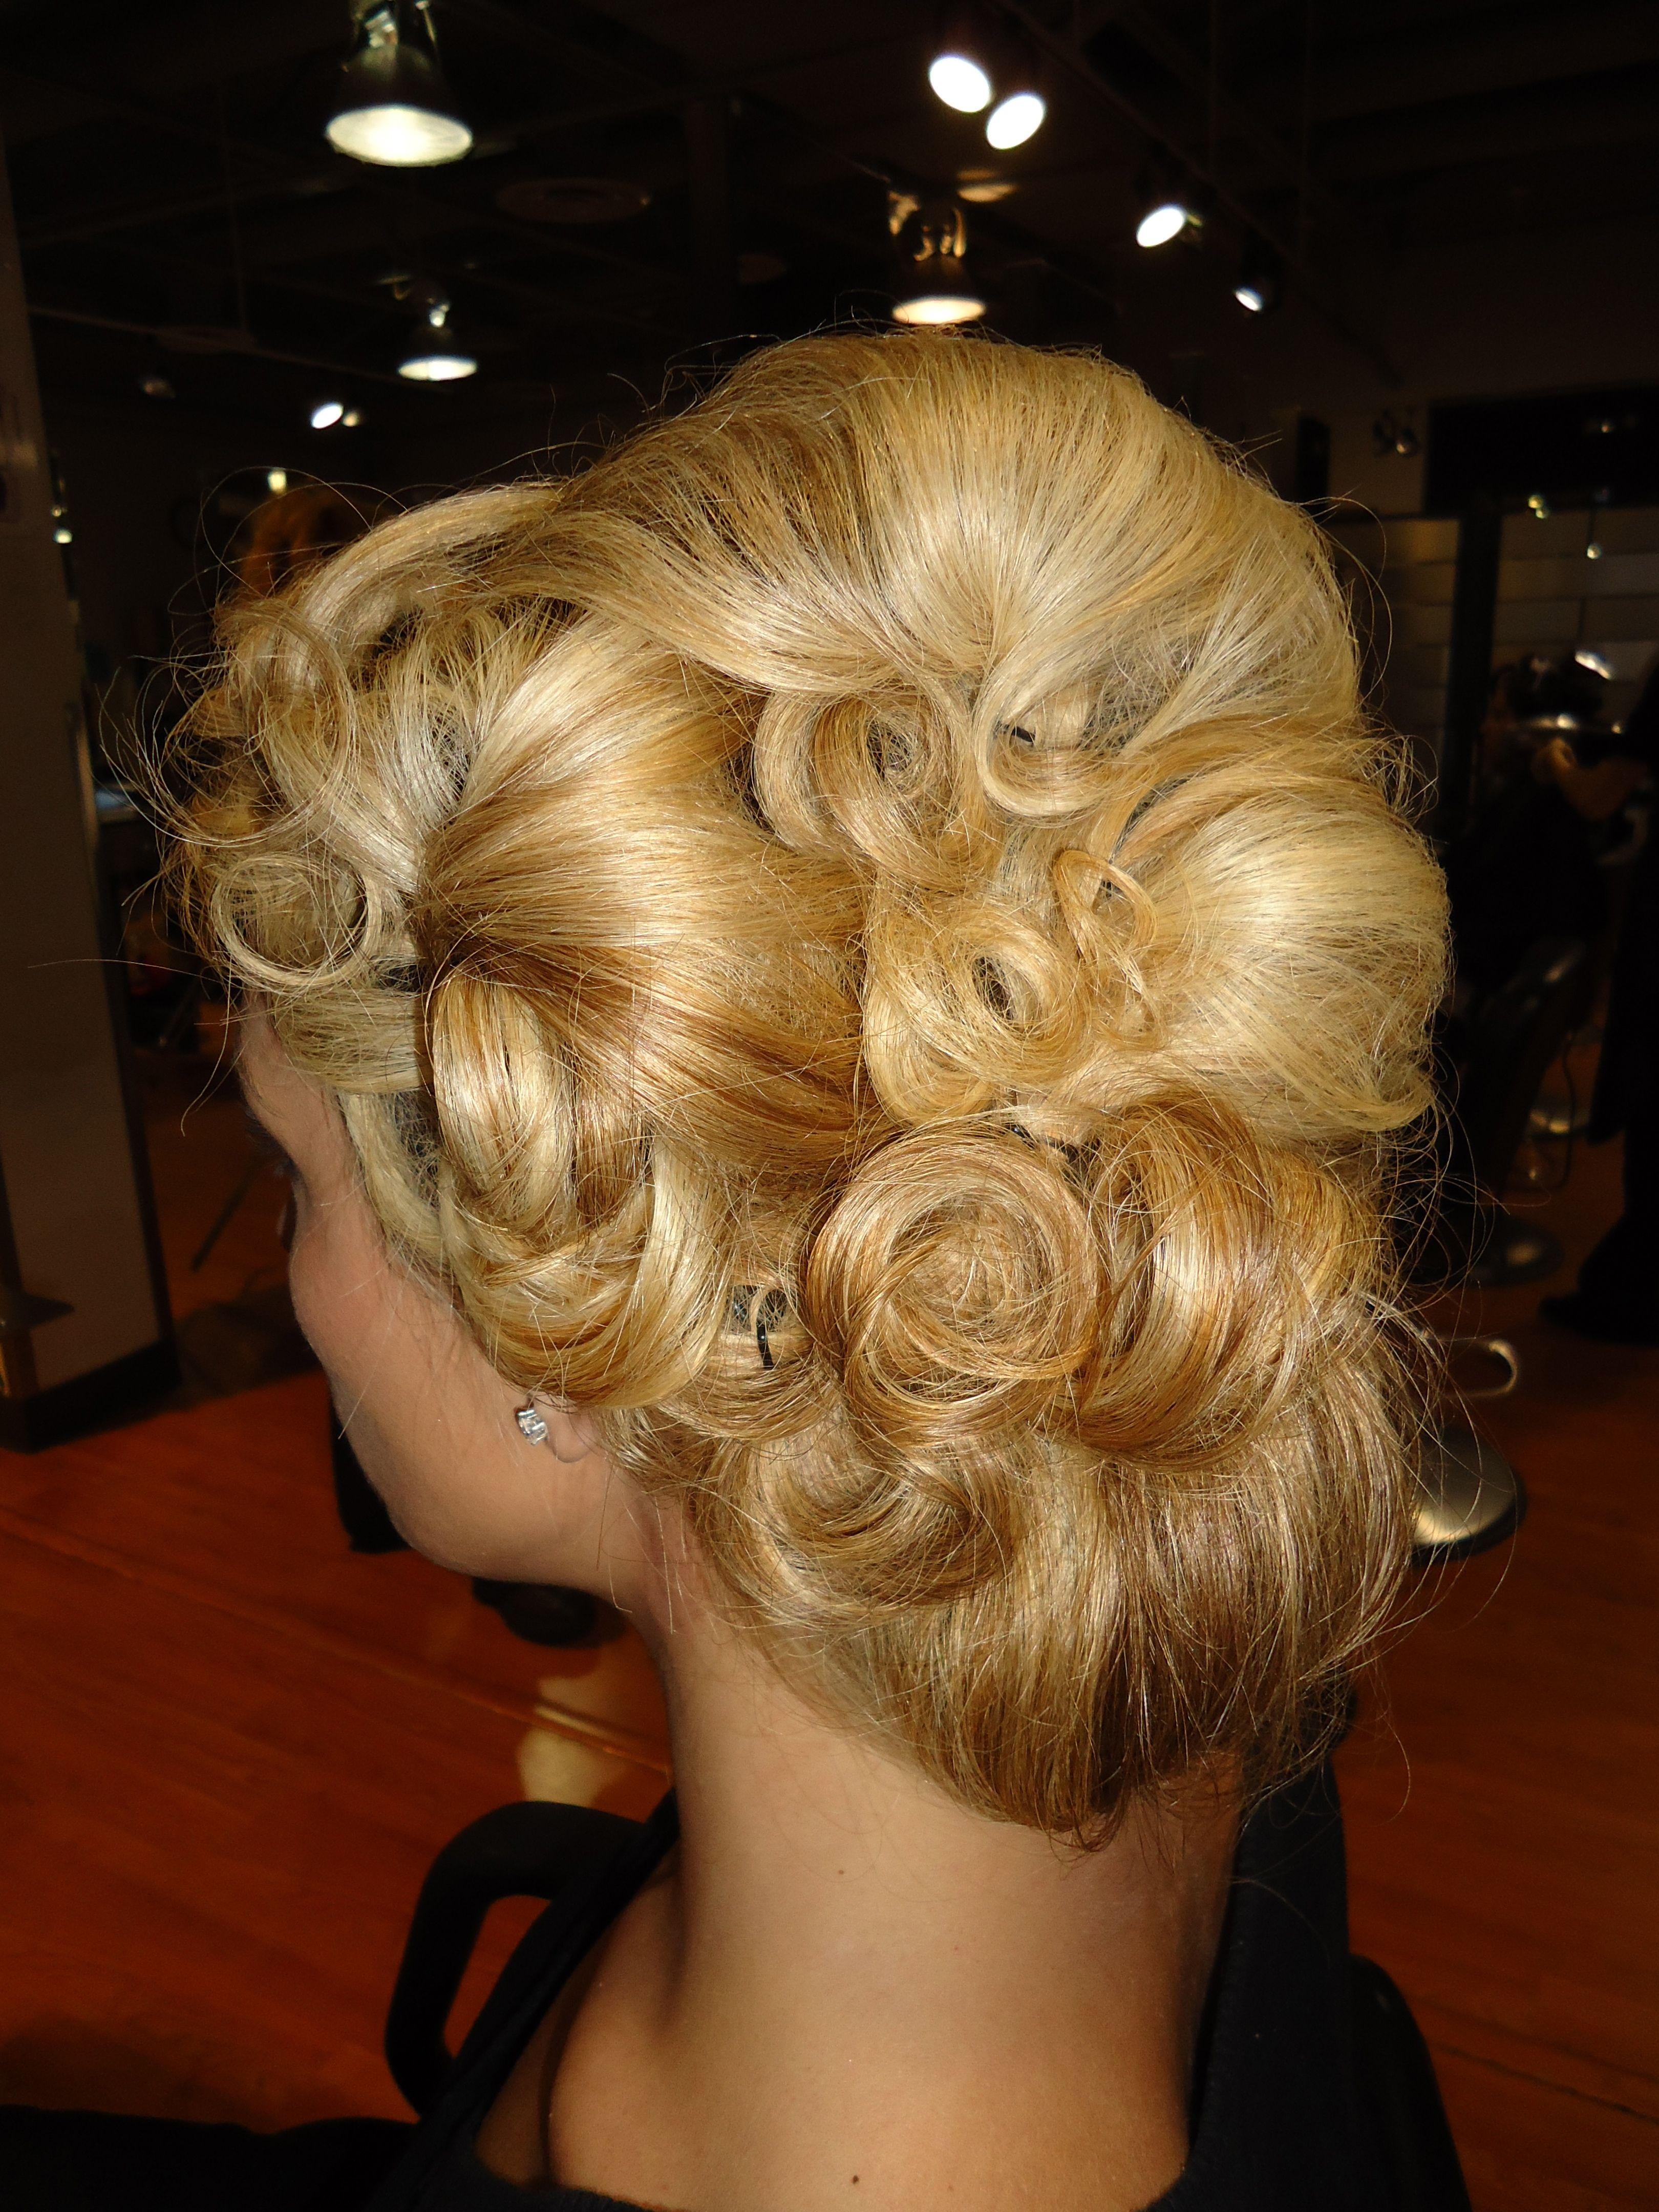 Usmc haircut styles paulmitchell do  hair by melissa diforti paul mitchell the